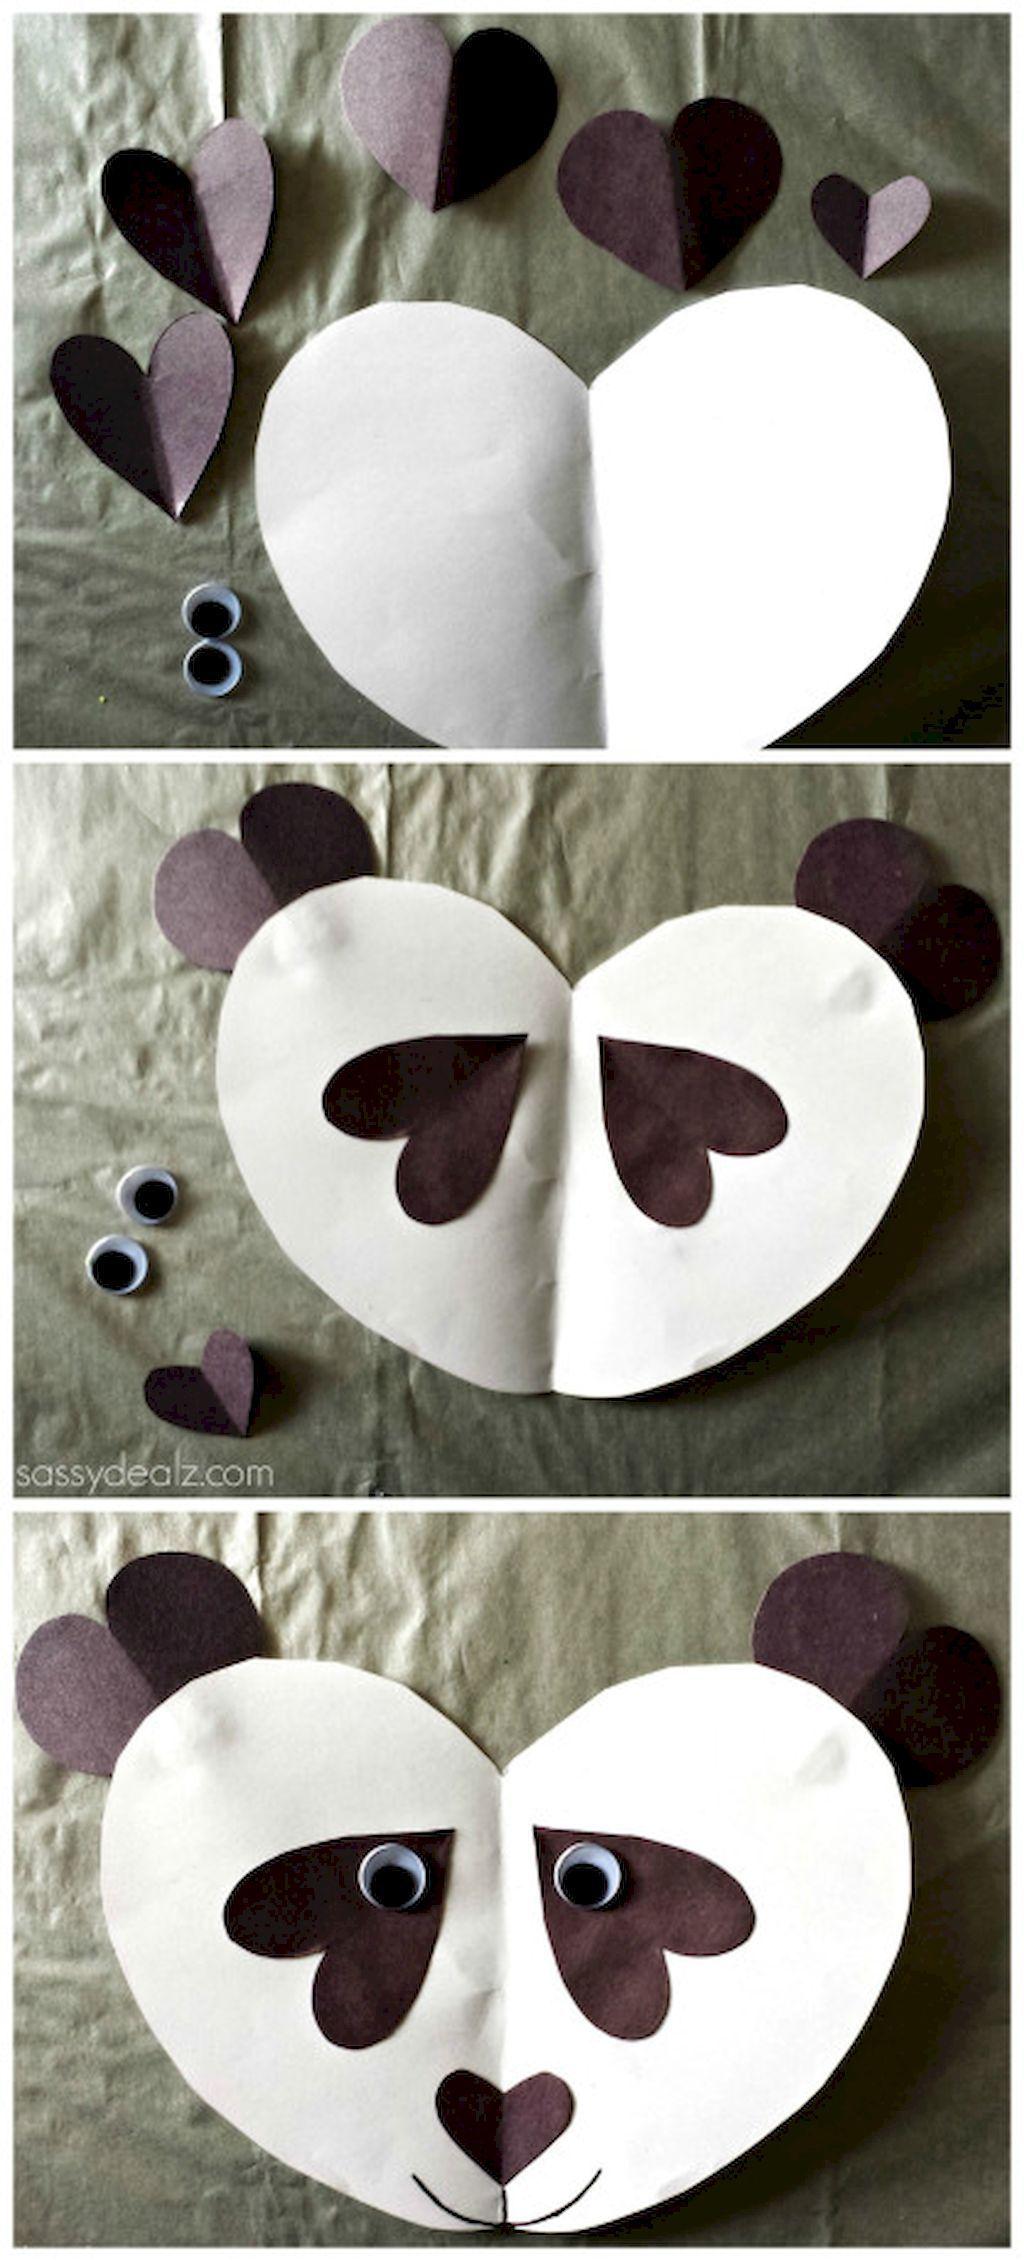 60 Romantic Valentines Crafts Ideas On A Budget 11